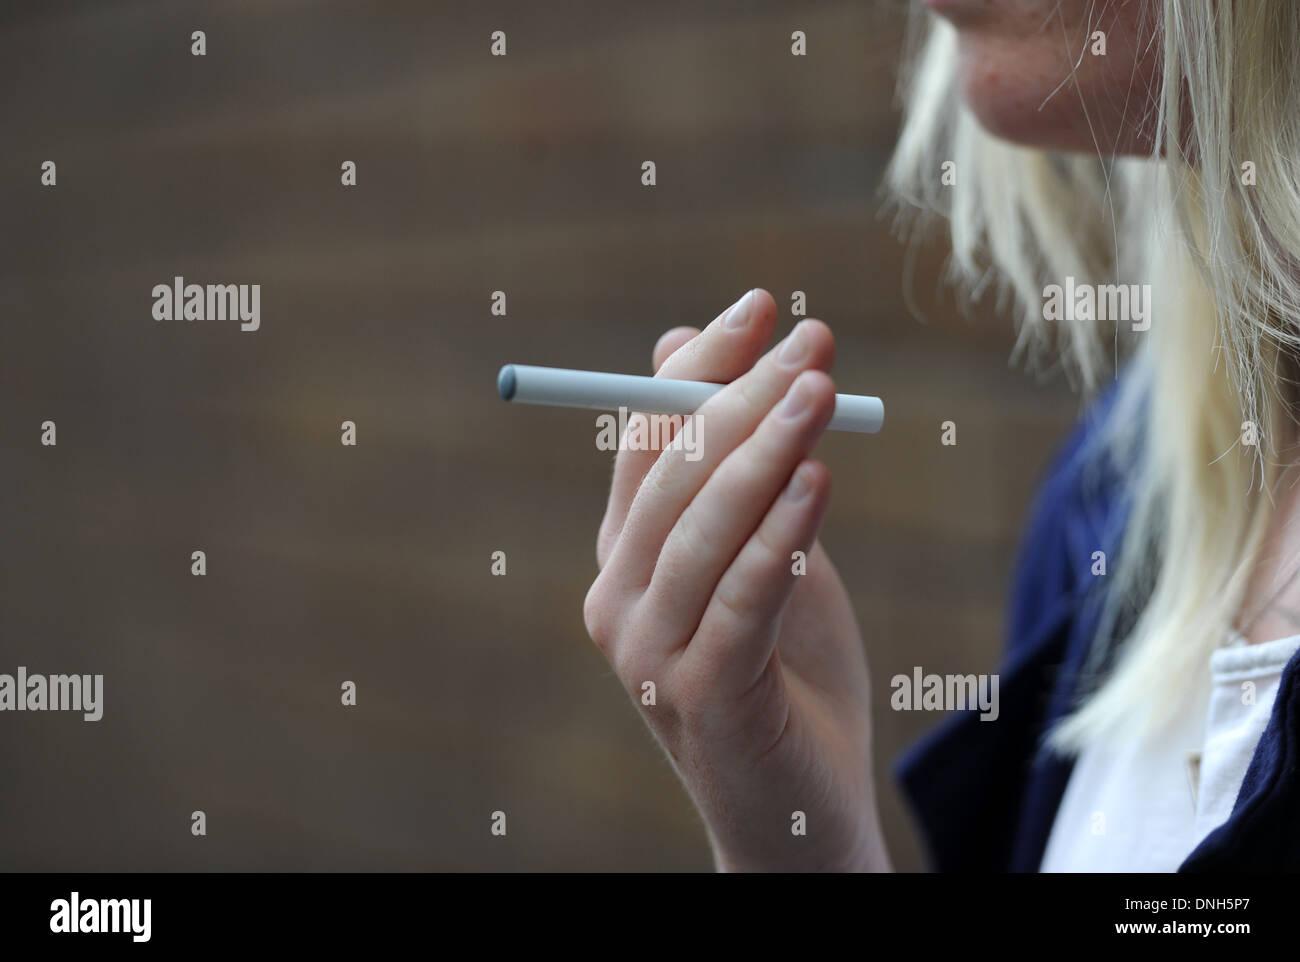 A female smoker holds an e-cigarette. - Stock Image